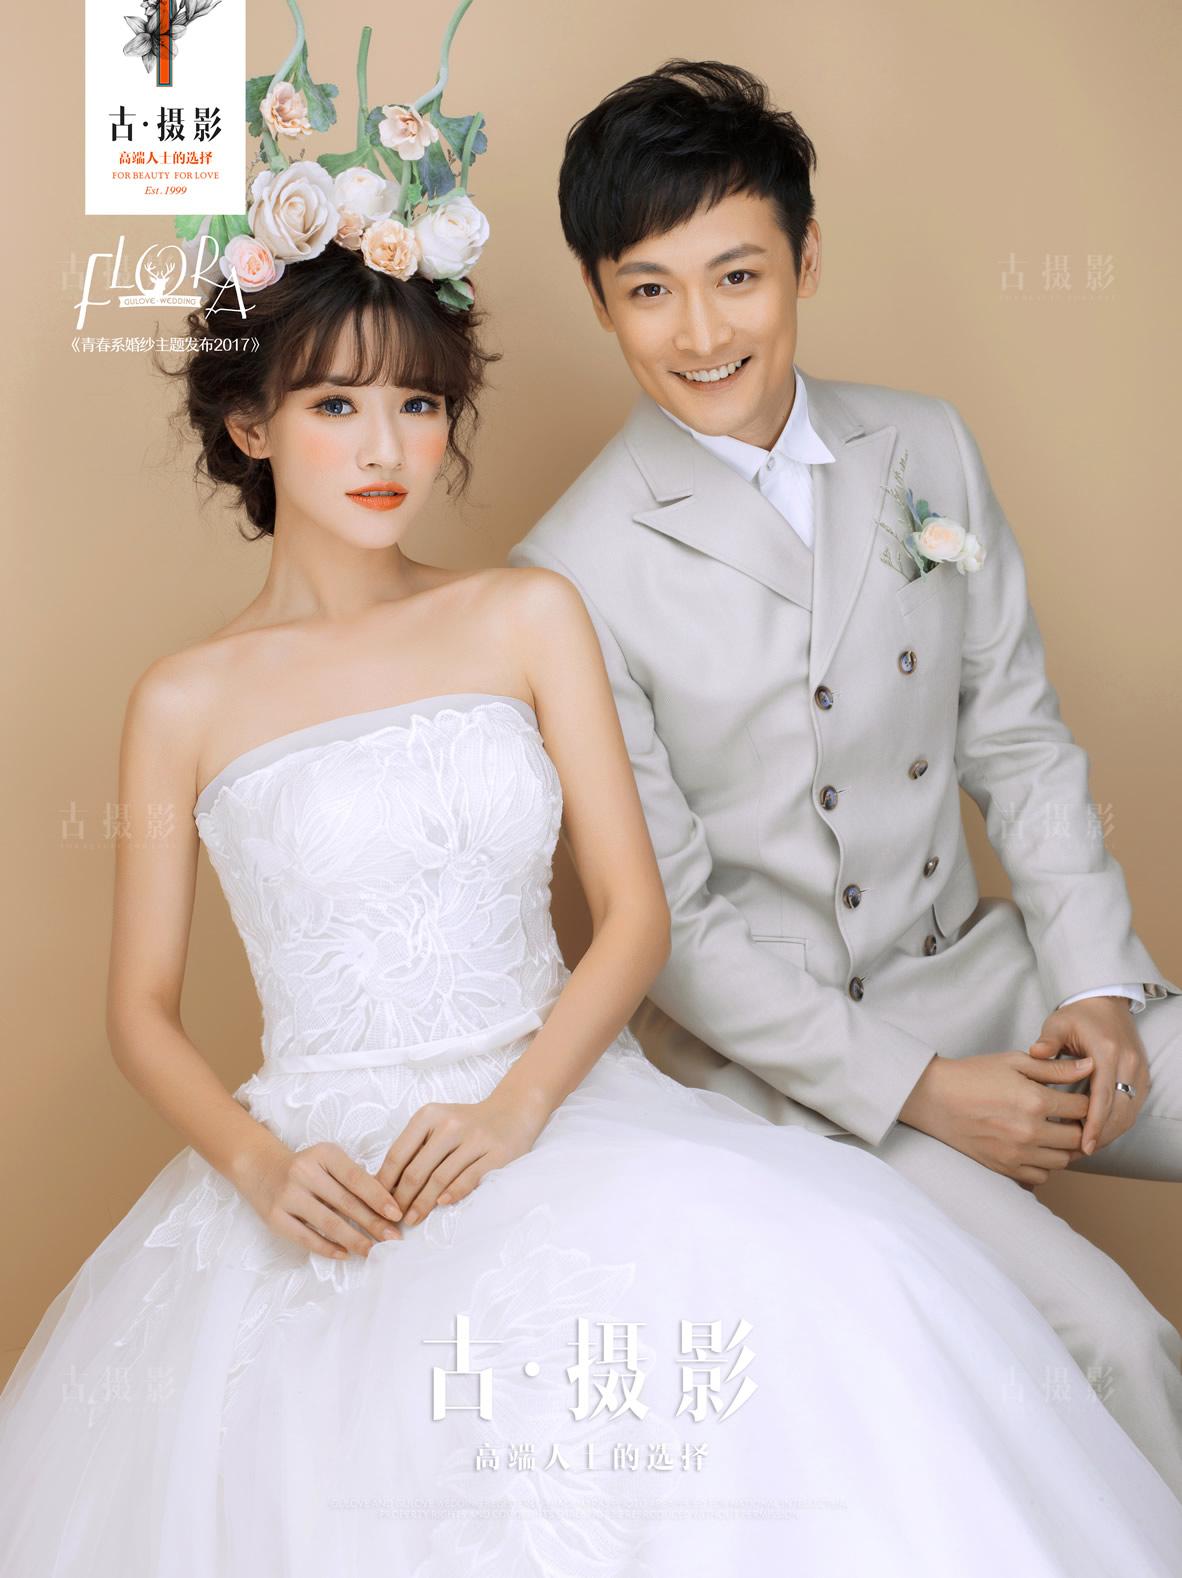 flowers Ⅲ - 明星范 - love上海古摄影-上海婚纱摄影网